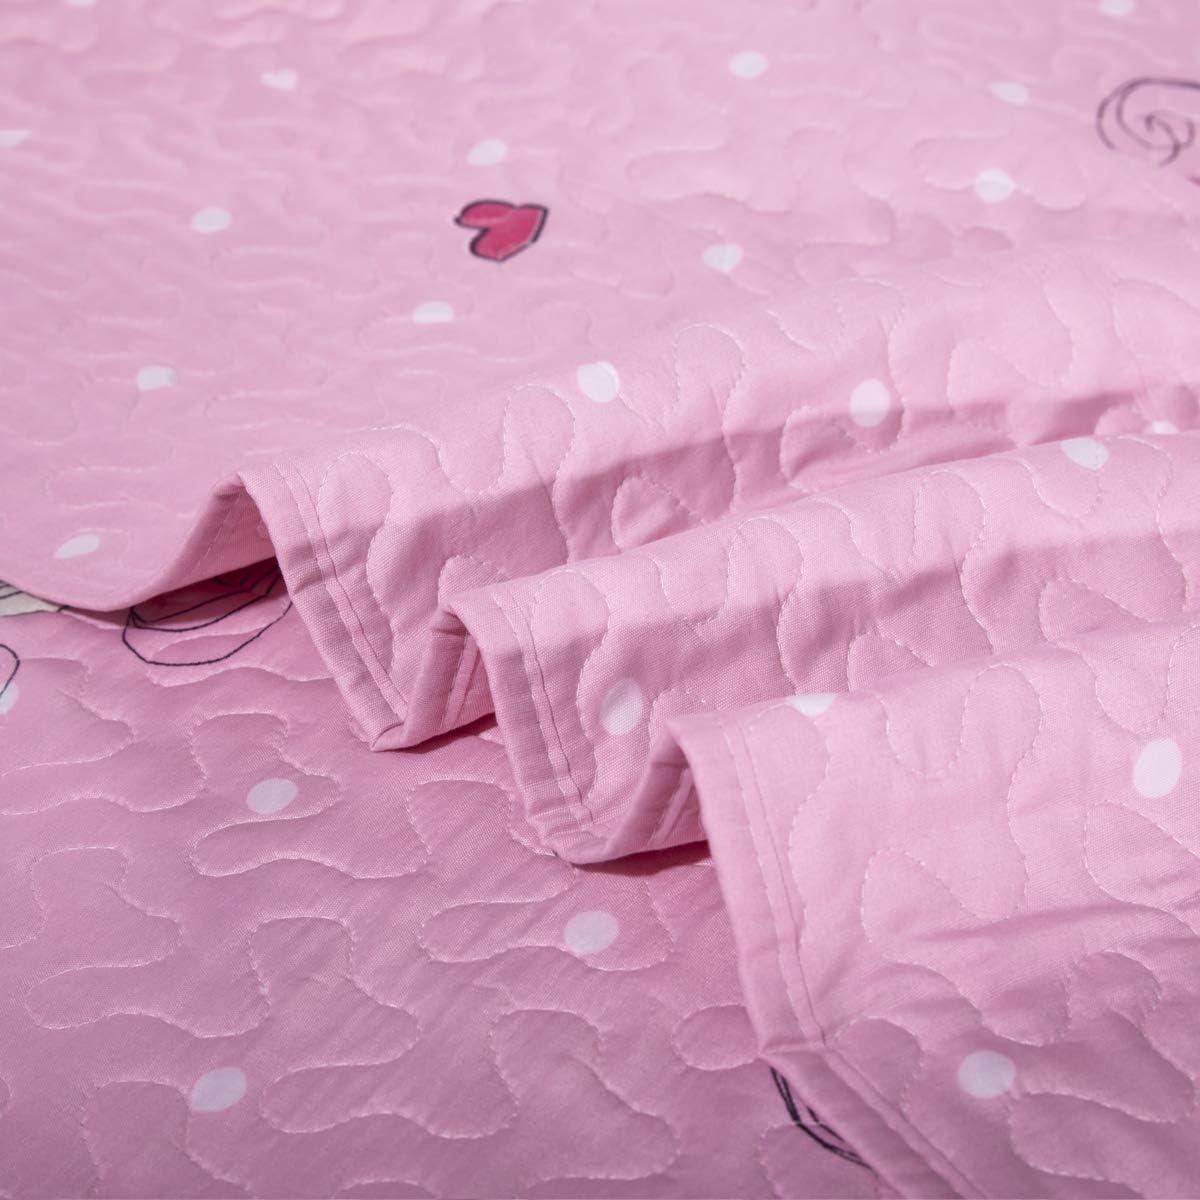 Kids Unicorn Quilt Set with Sham Twin Size Animal Cartoon Bedding Set Soft Reversible Bedspread Coverlet All Season Bed Set for Kids Teens Girls 1 Quilt 2 Pillowshams Pink